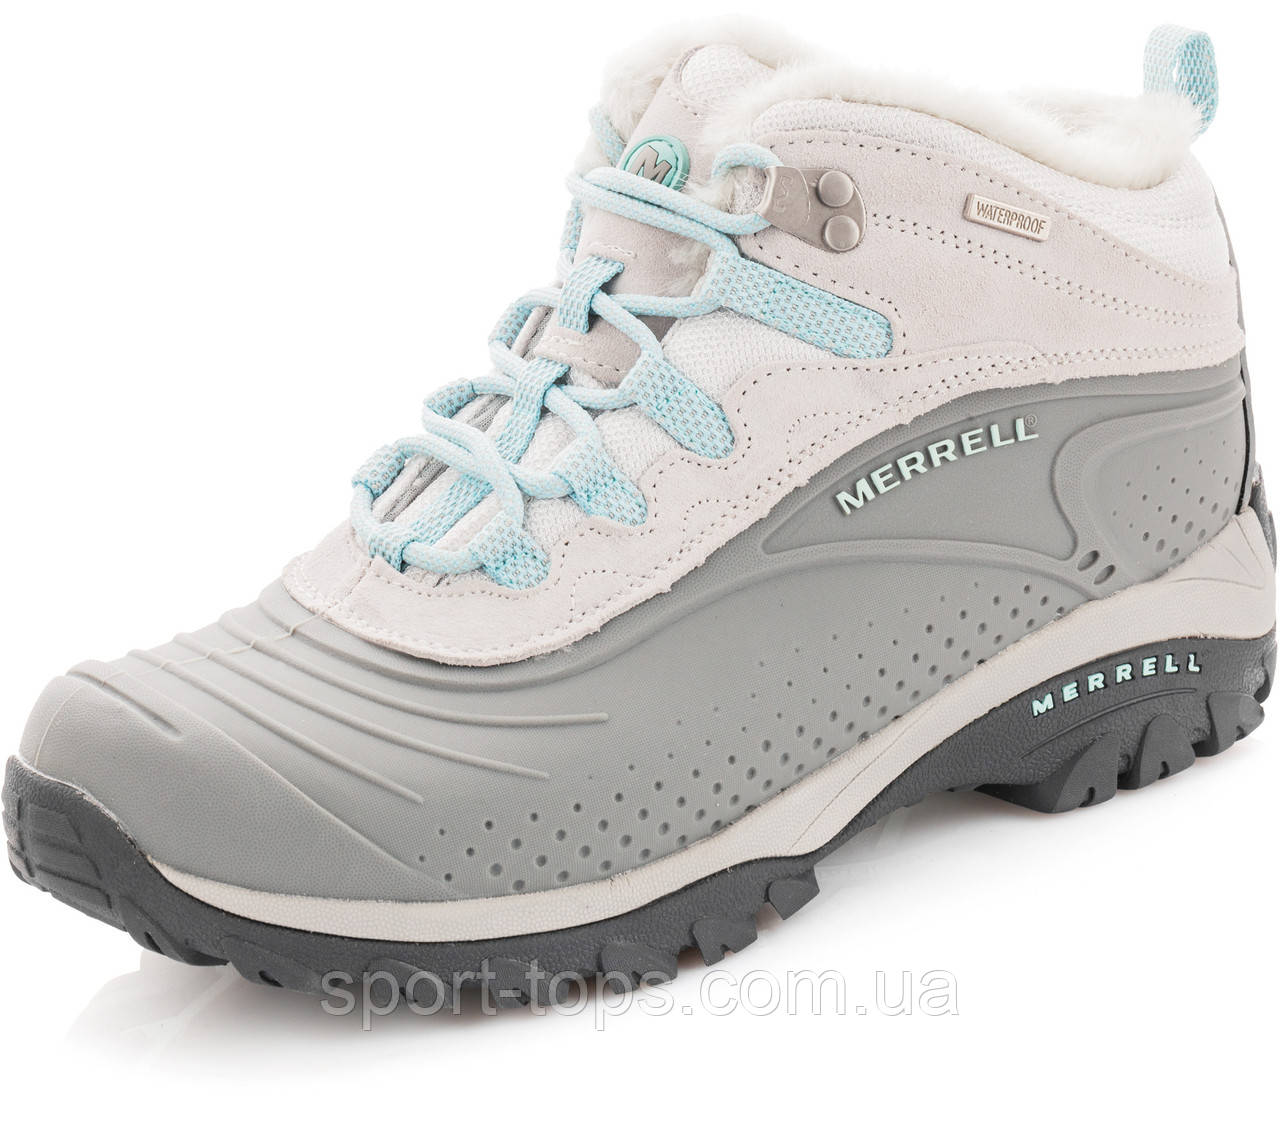 Ботинки утепленные женские Merrell Storm Trekker